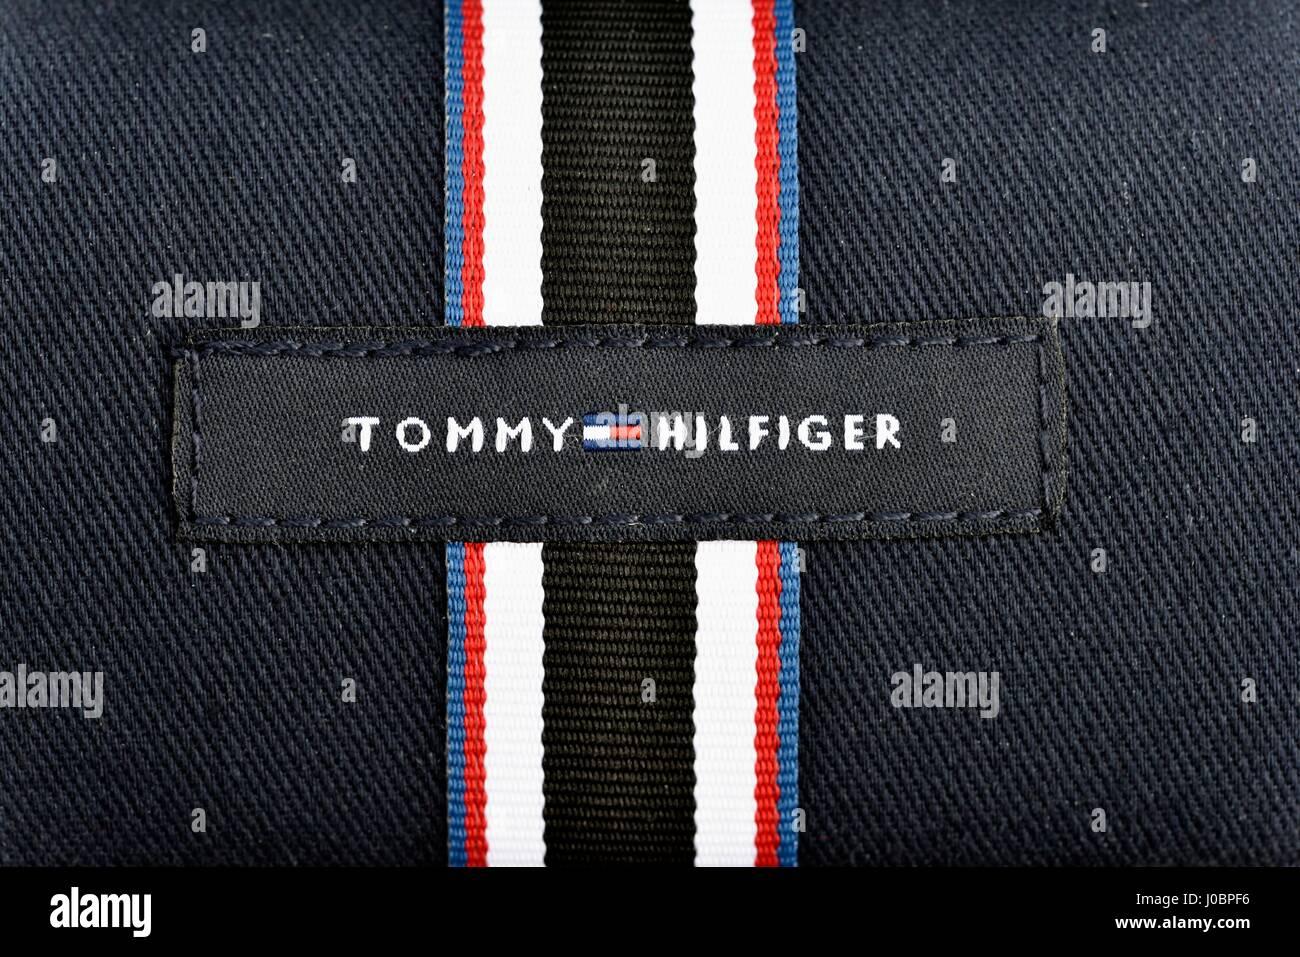 7e41f1ed Tommy Hilfiger Logo Stock Photos & Tommy Hilfiger Logo Stock Images ...